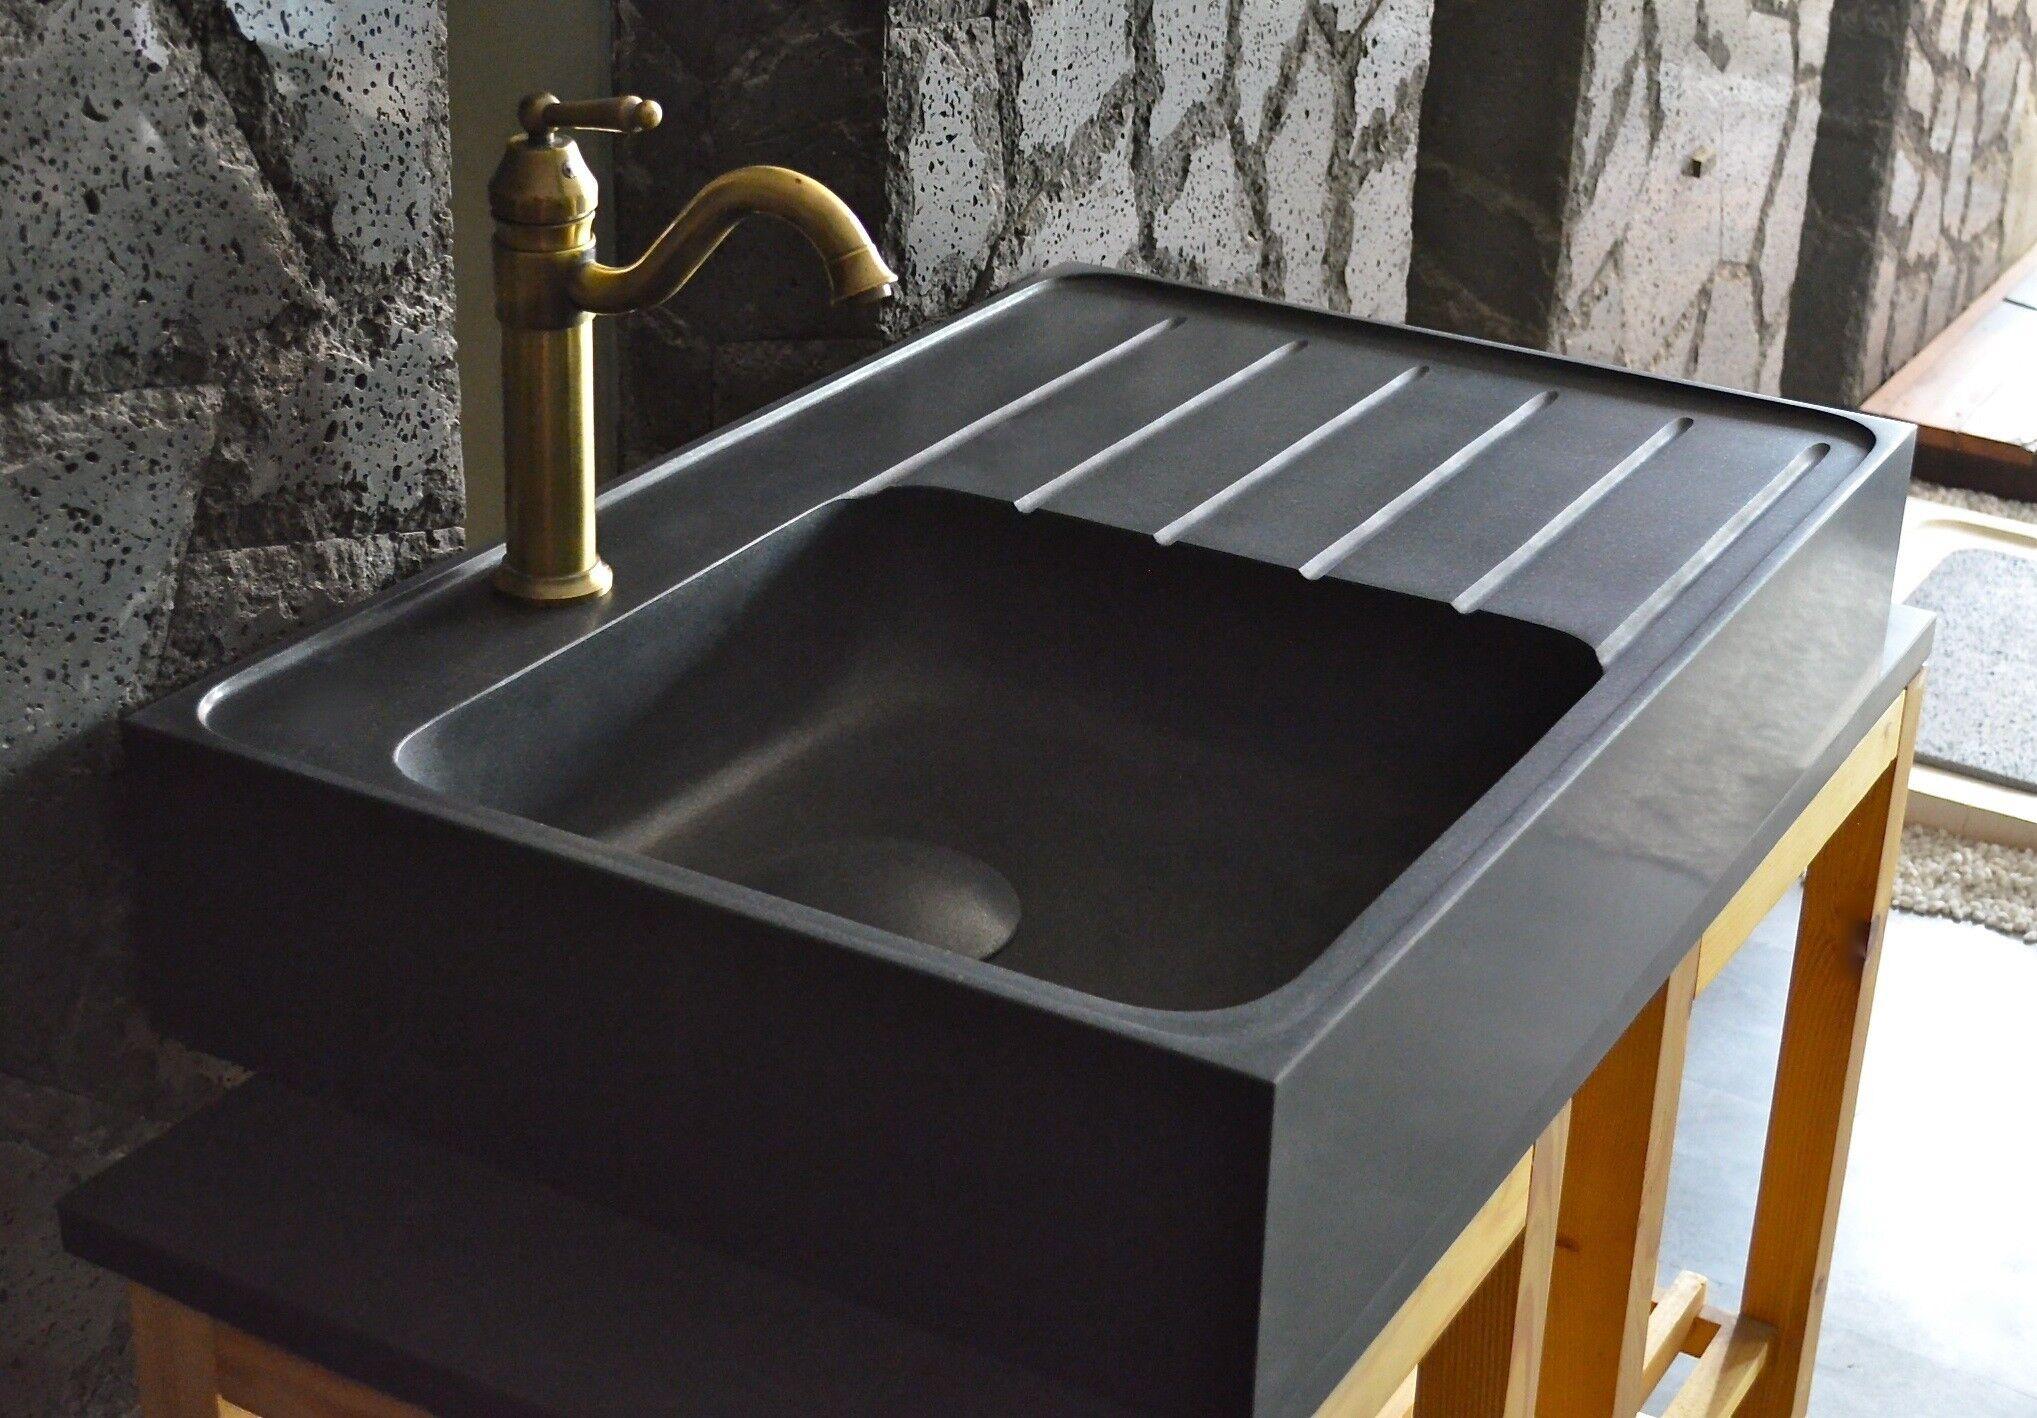 LivingRoc Évier de cuisine pierre 90x60 Granit Noir Luxe NORWAY SHADOW